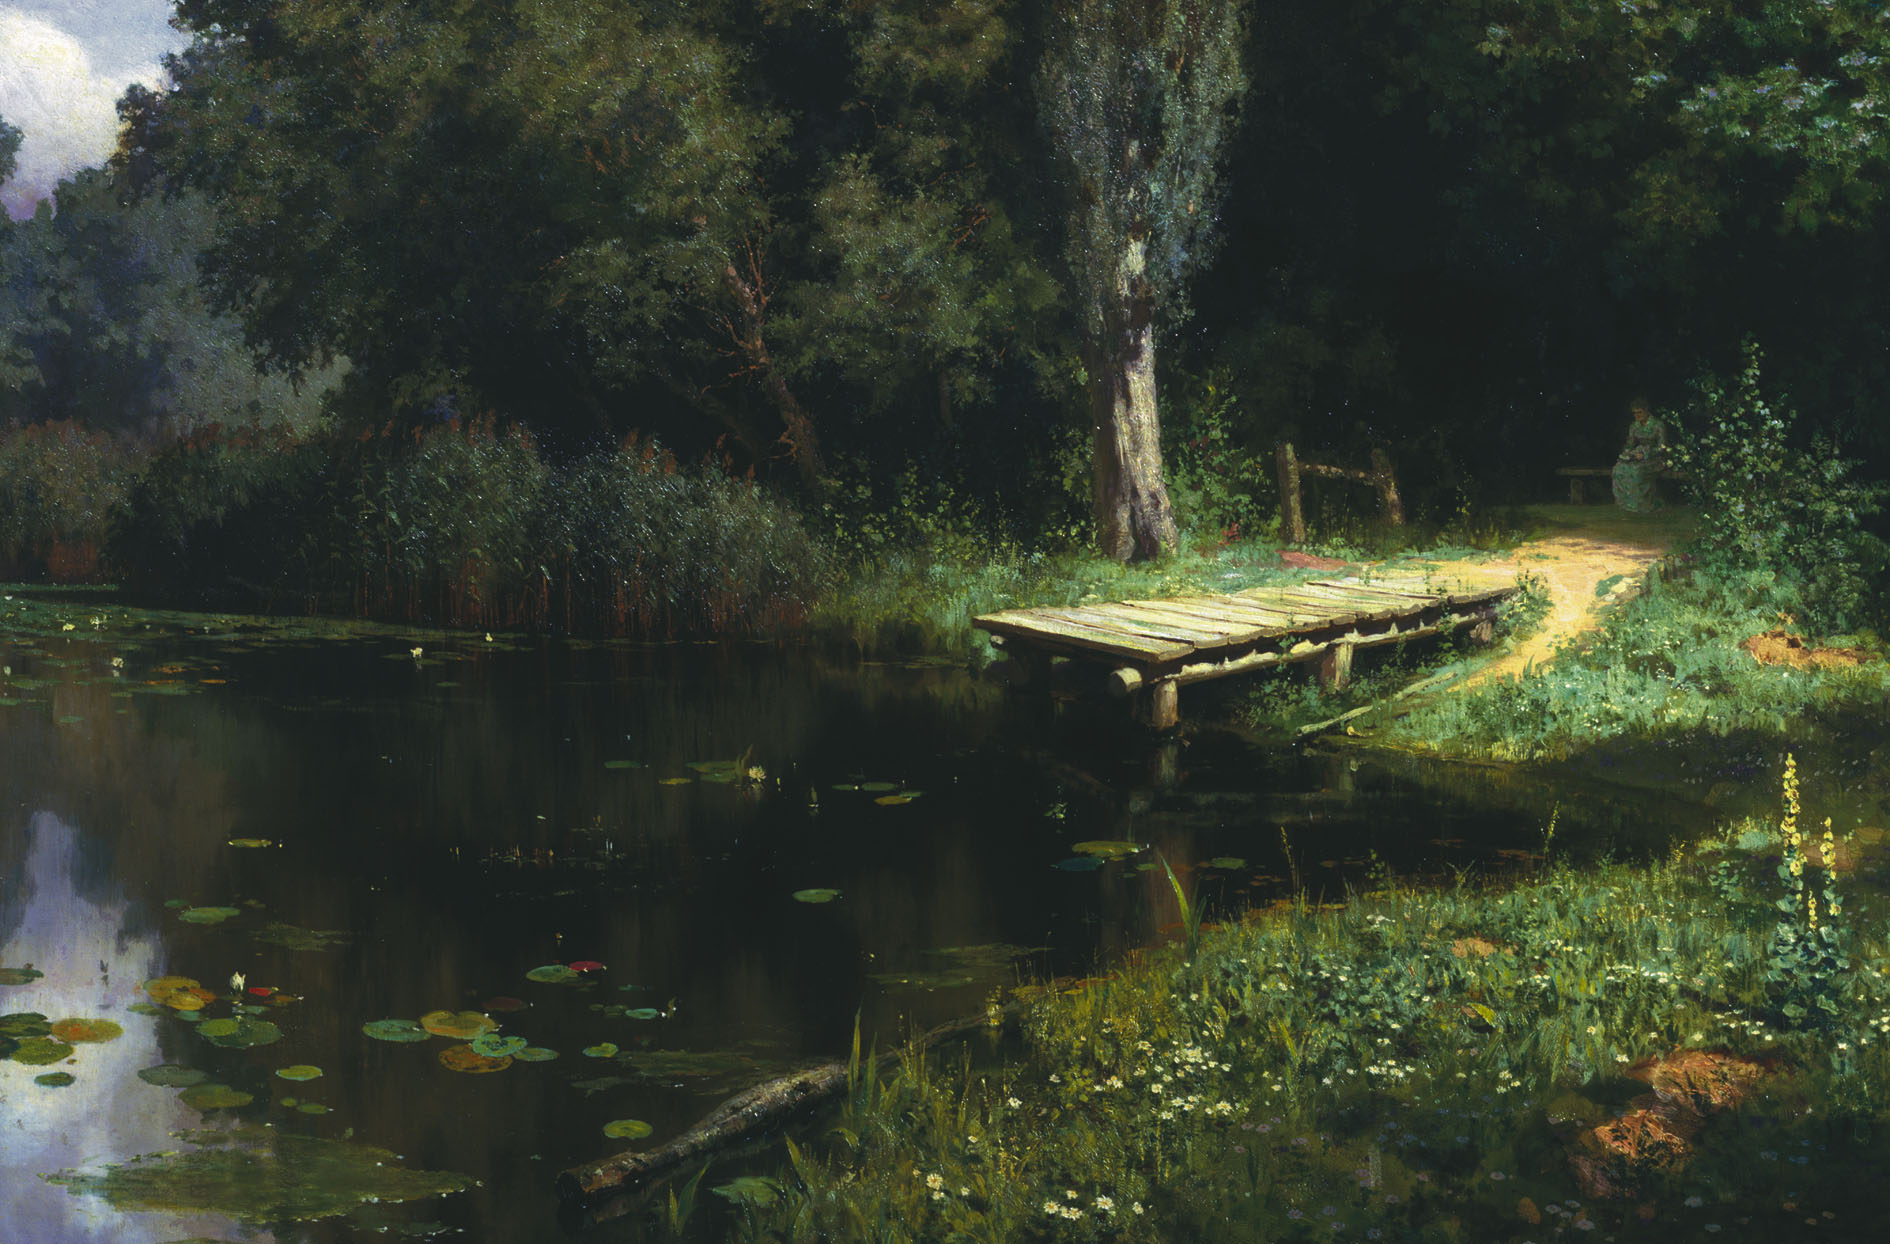 Заросший пруд (картина Поленова) - это ...: dic.academic.ru/dic.nsf/ruwiki/1794891